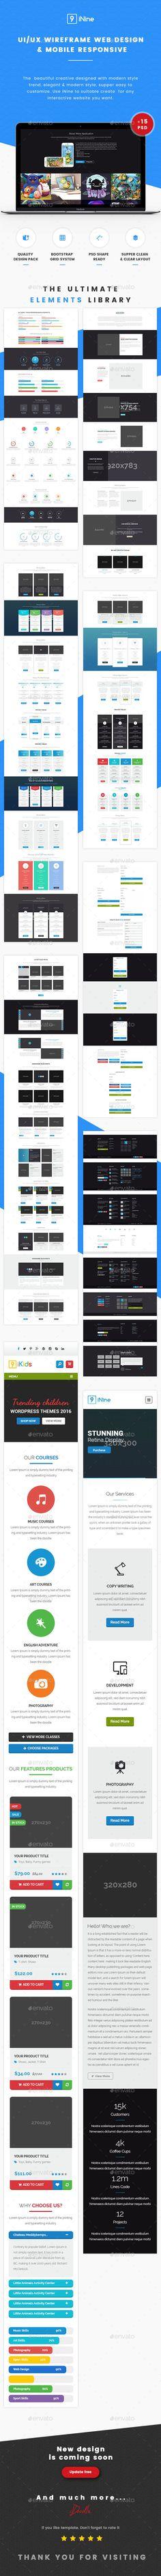 Berühmt Ux Designvorlagen Fotos - Entry Level Resume Vorlagen ...